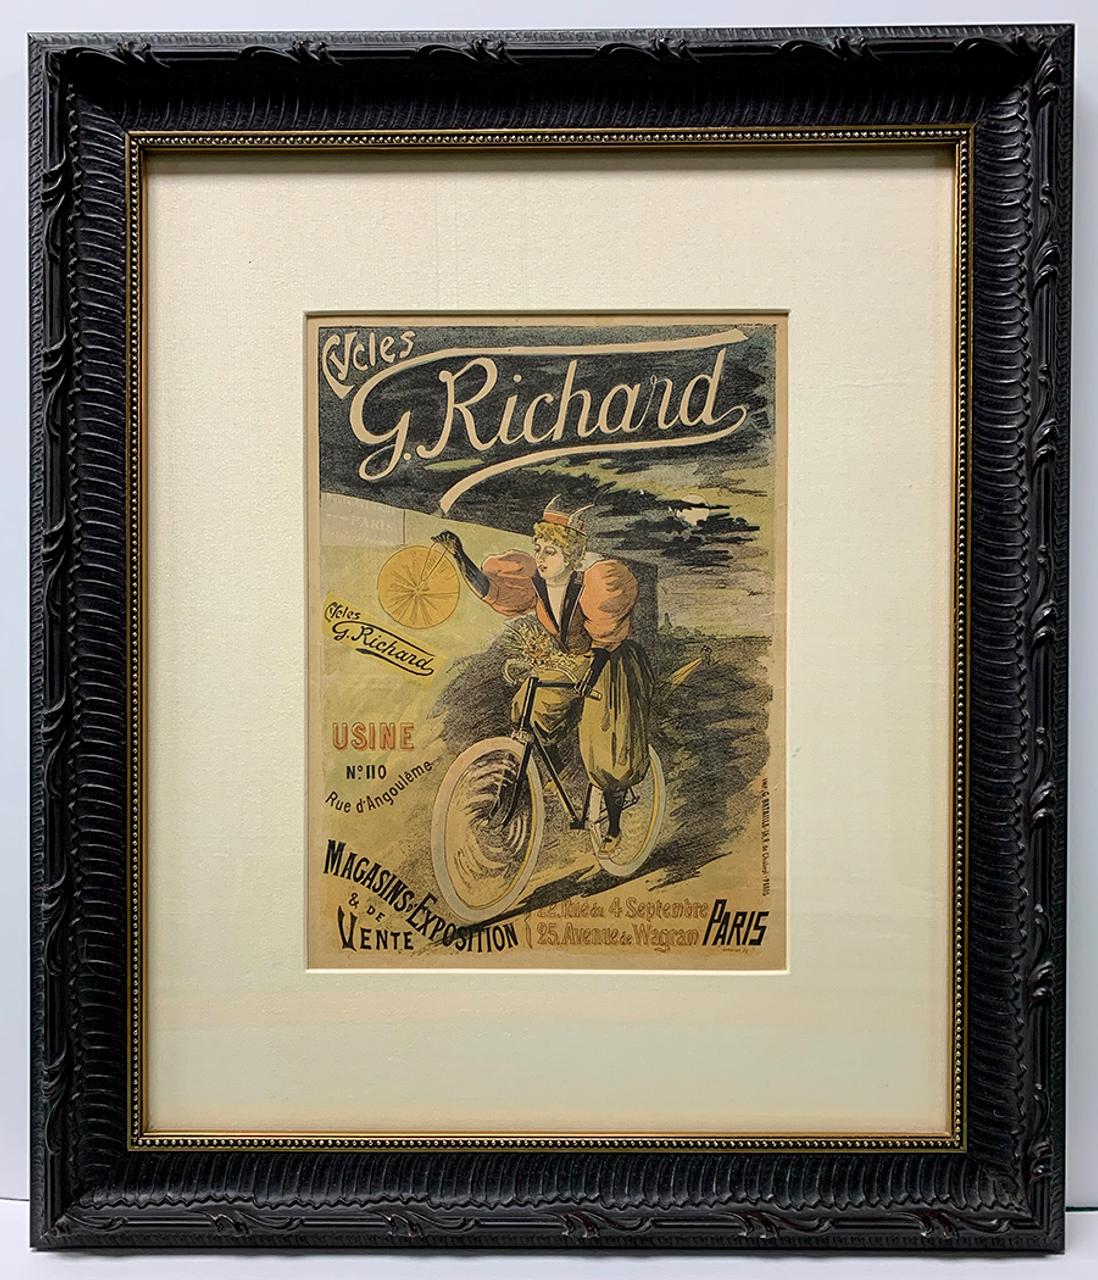 Cycles G. Richard advertisement - Le Rire Magazine - July 24, 1895